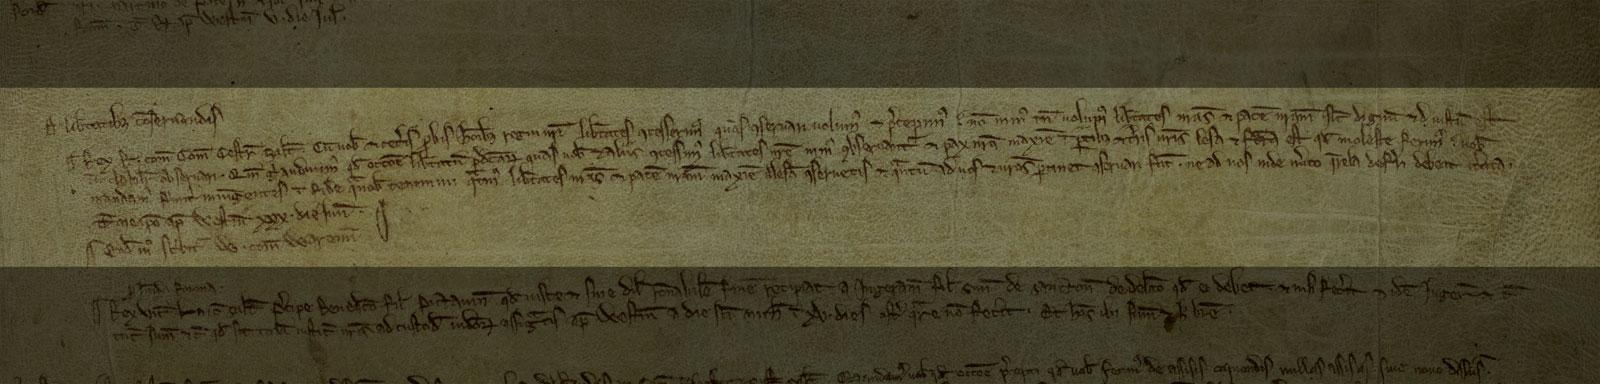 Magna Carta exploited, Chester, 1225 (C 54/34)